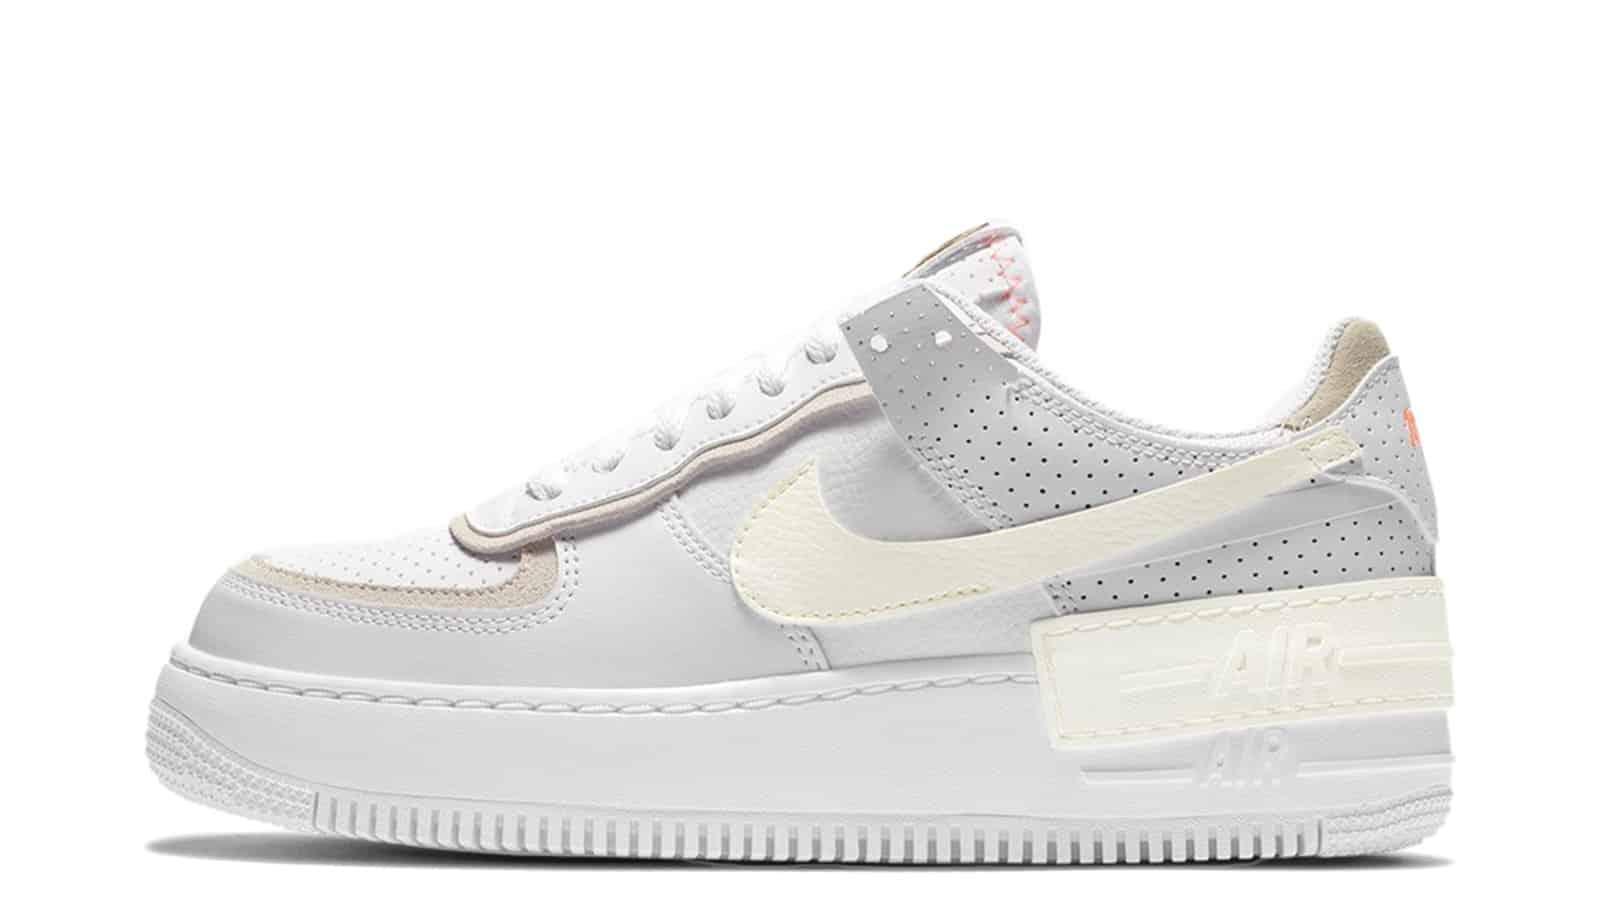 Nike Air Force 1 Shadow 'White/Atomic Pink'